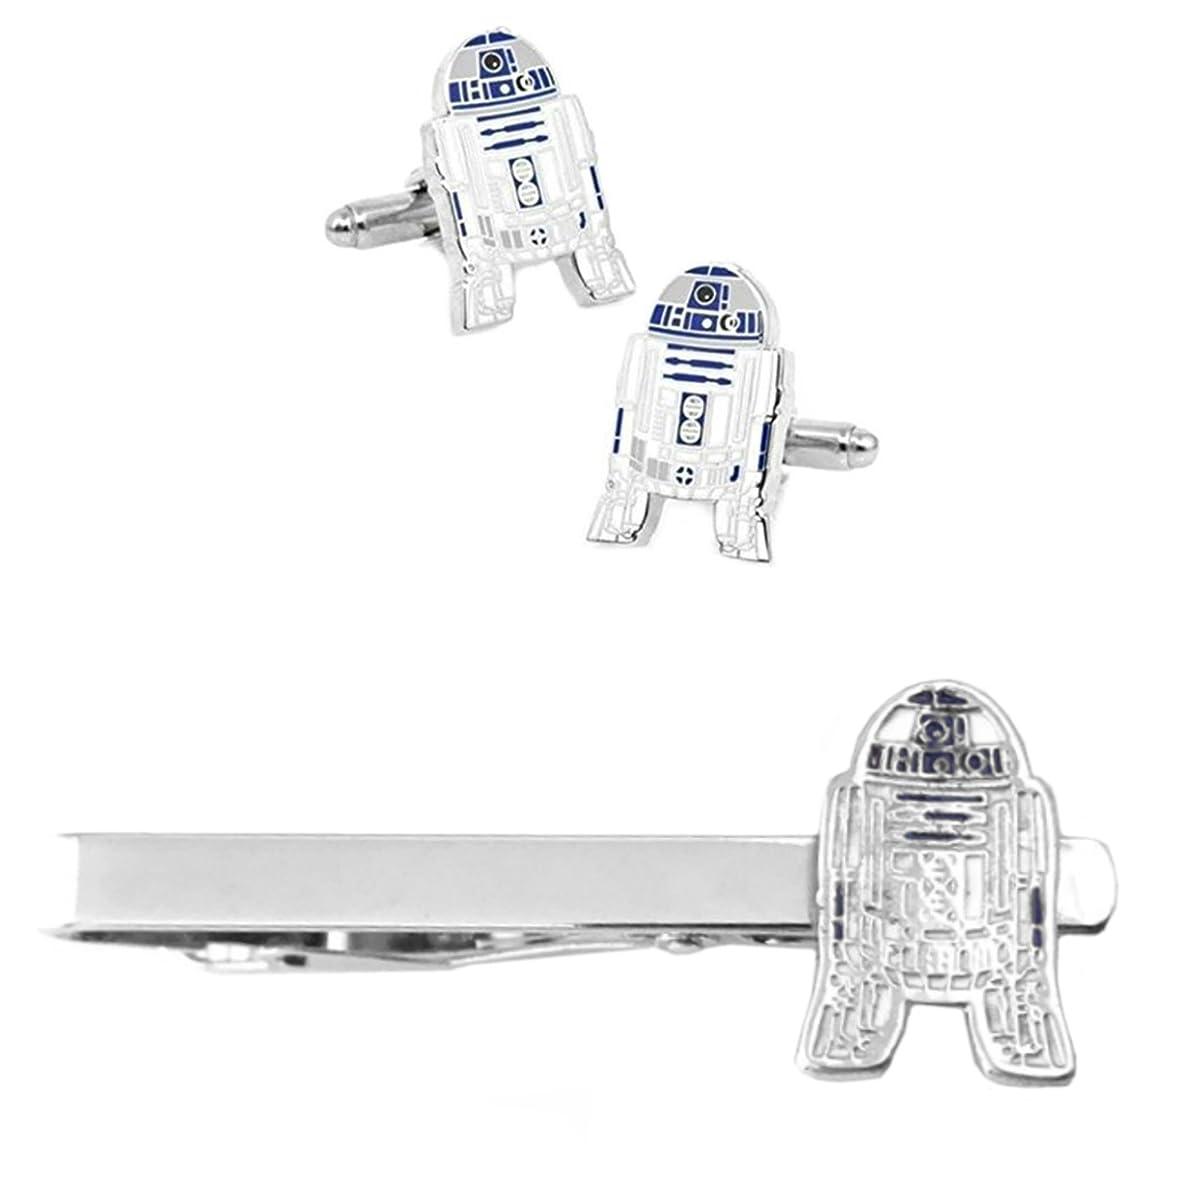 Outlander R2-D2 Cufflink & Tiebar - New 2018 Star Wars Movies - Set of 2 Wedding Logo w/Gift Box